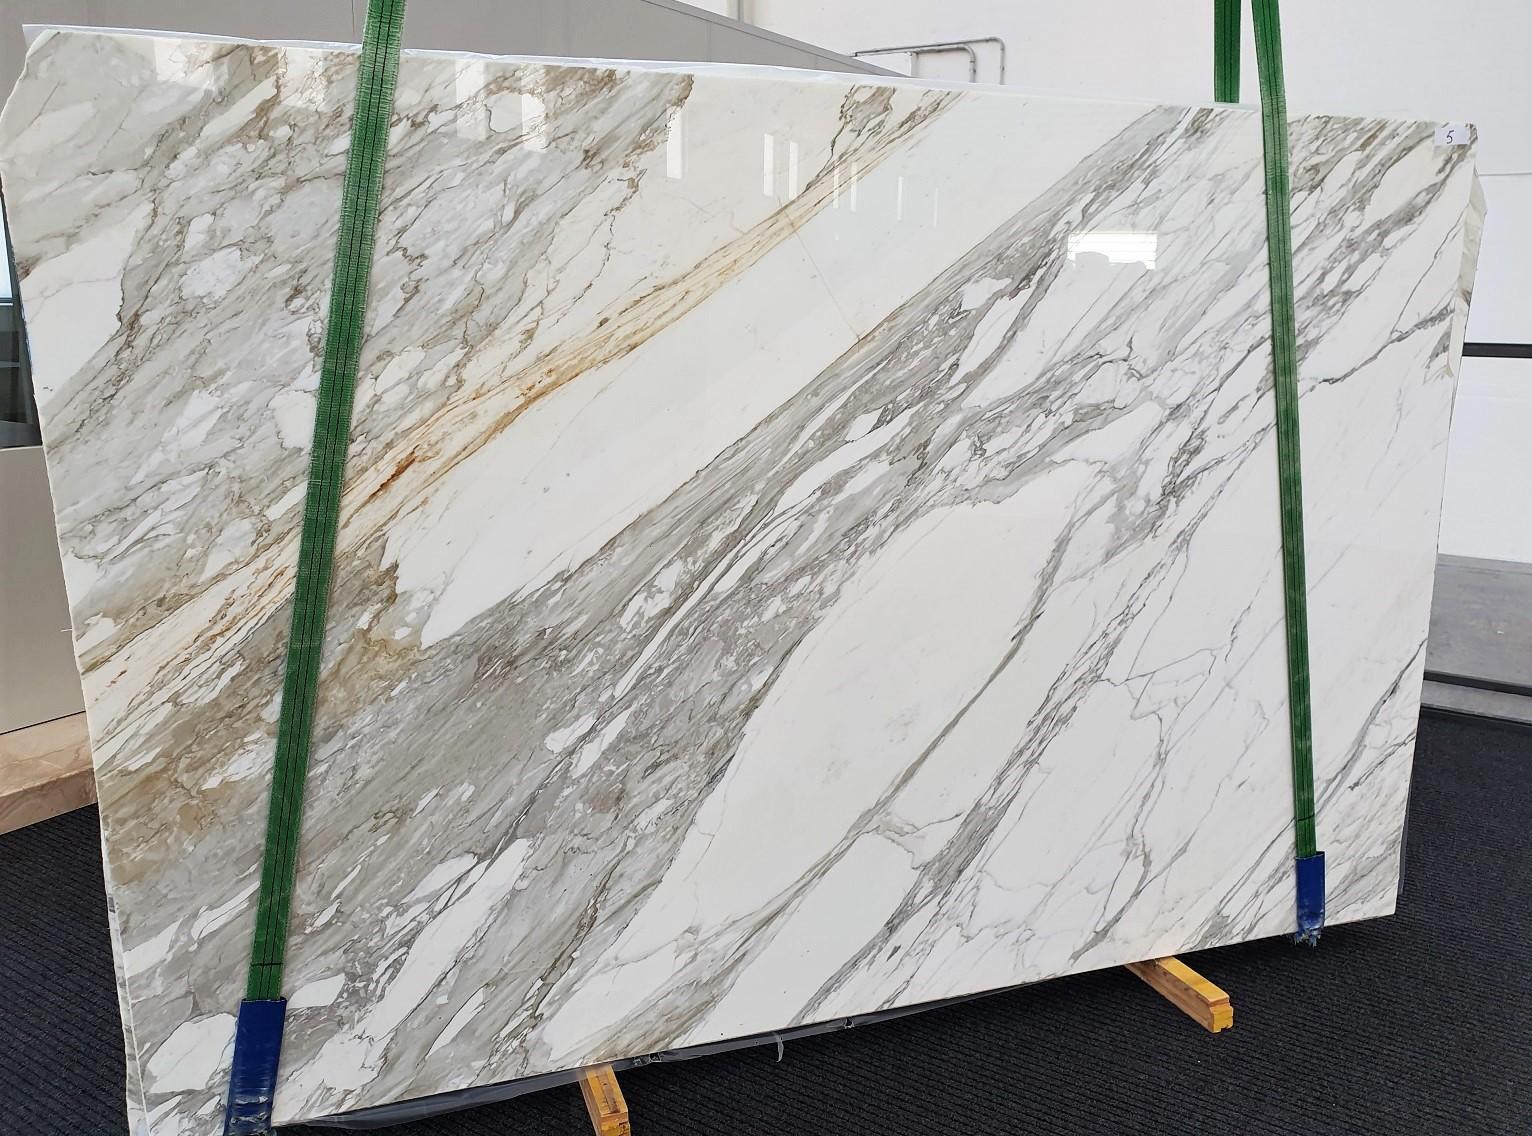 CALACATTA Supply Veneto (Italy) polished slabs 1344 , A - slab #05 natural marble